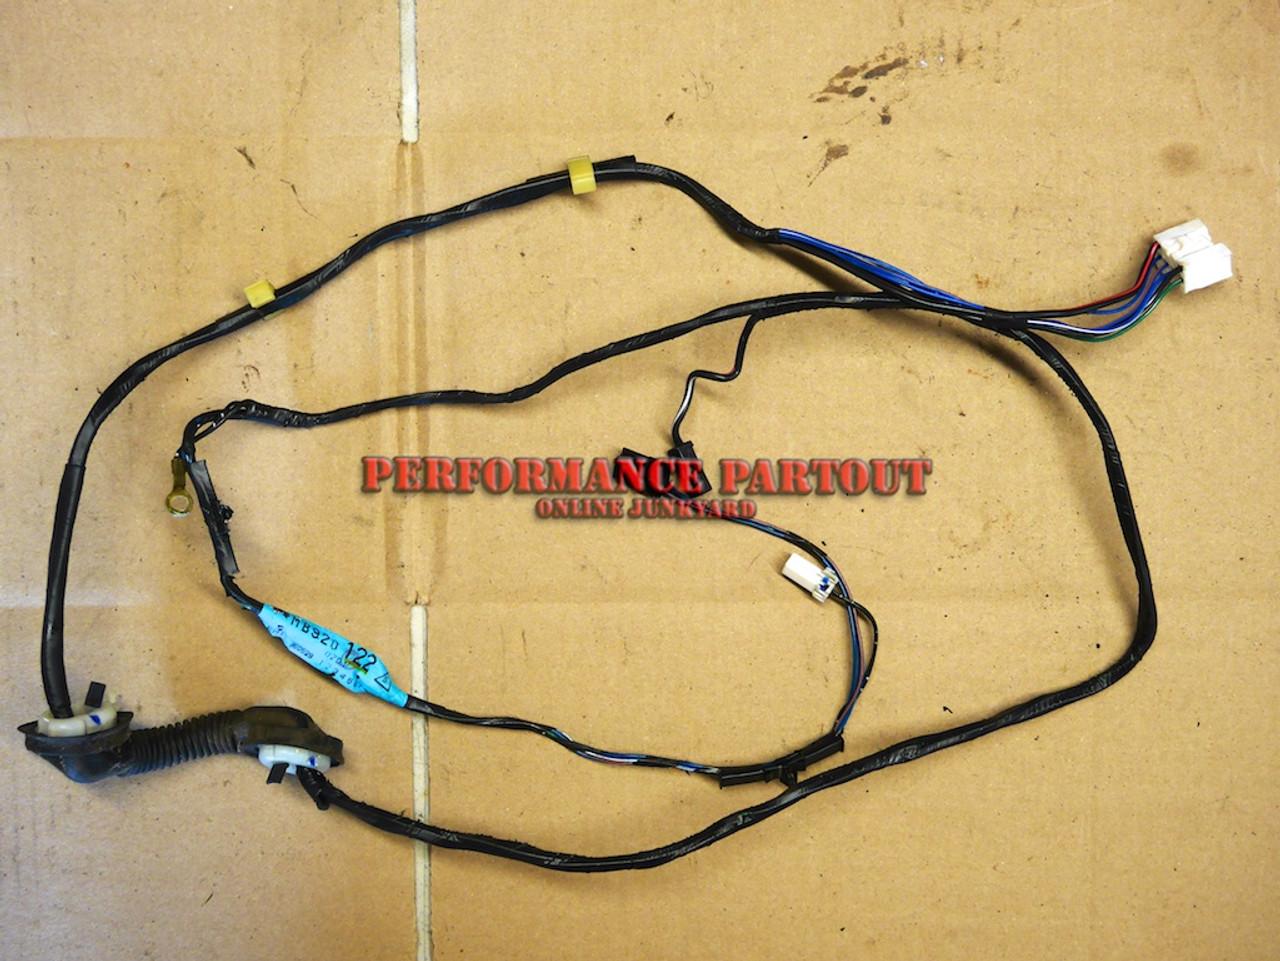 chrysler 08 tailgate wiring harness hatch wiring harness auto wiring diagrams  hatch wiring harness auto wiring diagrams